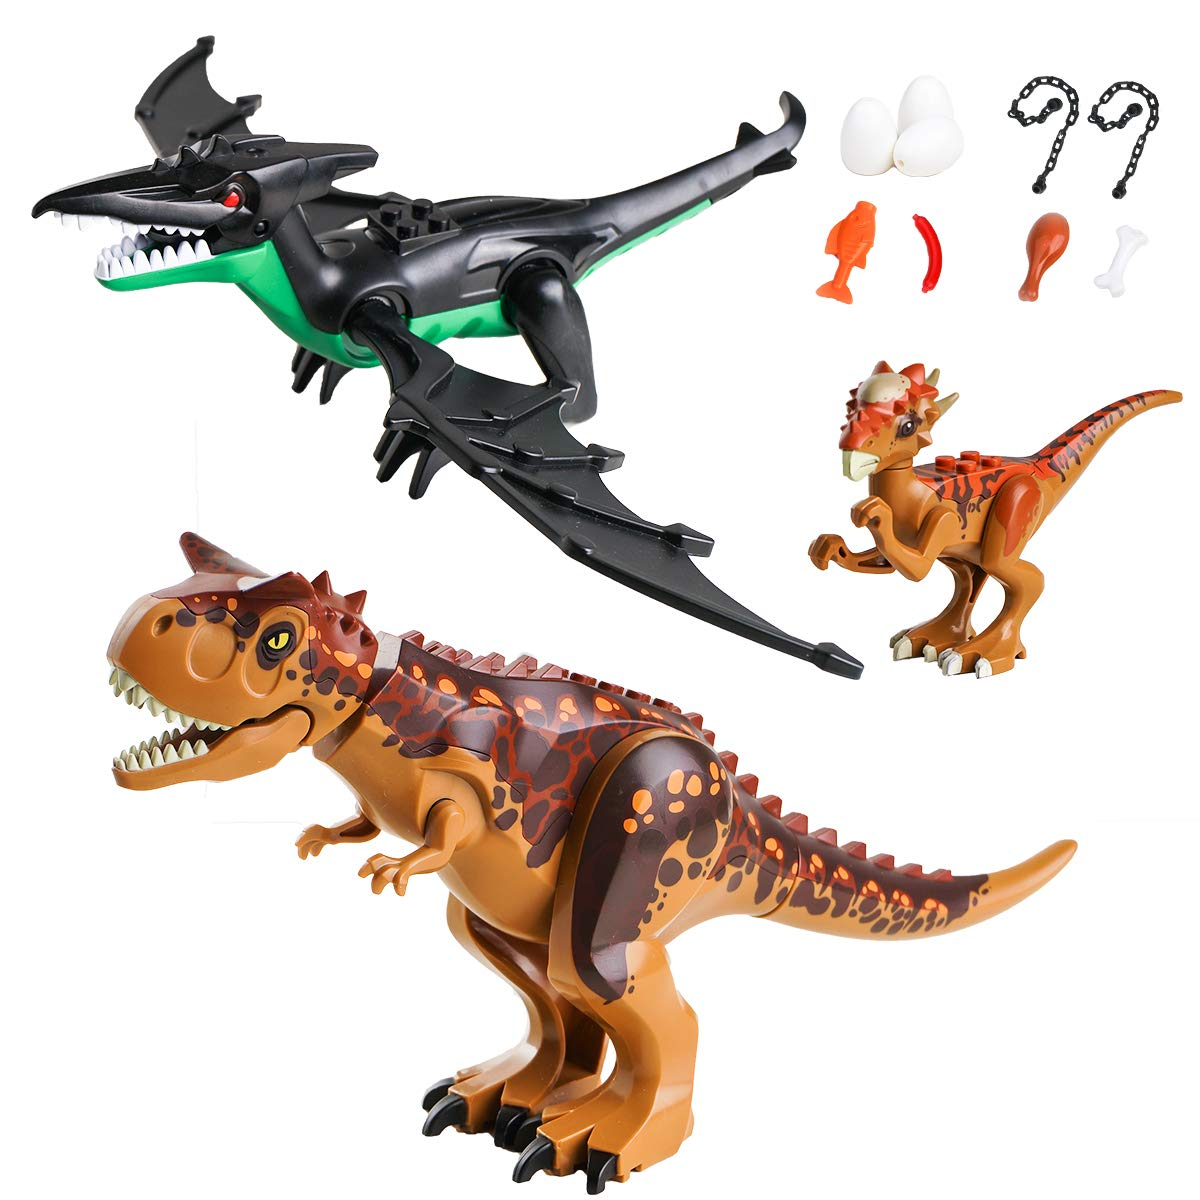 Maykid Dinosaur Sets,2 Large Dinosaurs,1 Small Dinosaur by Maykid